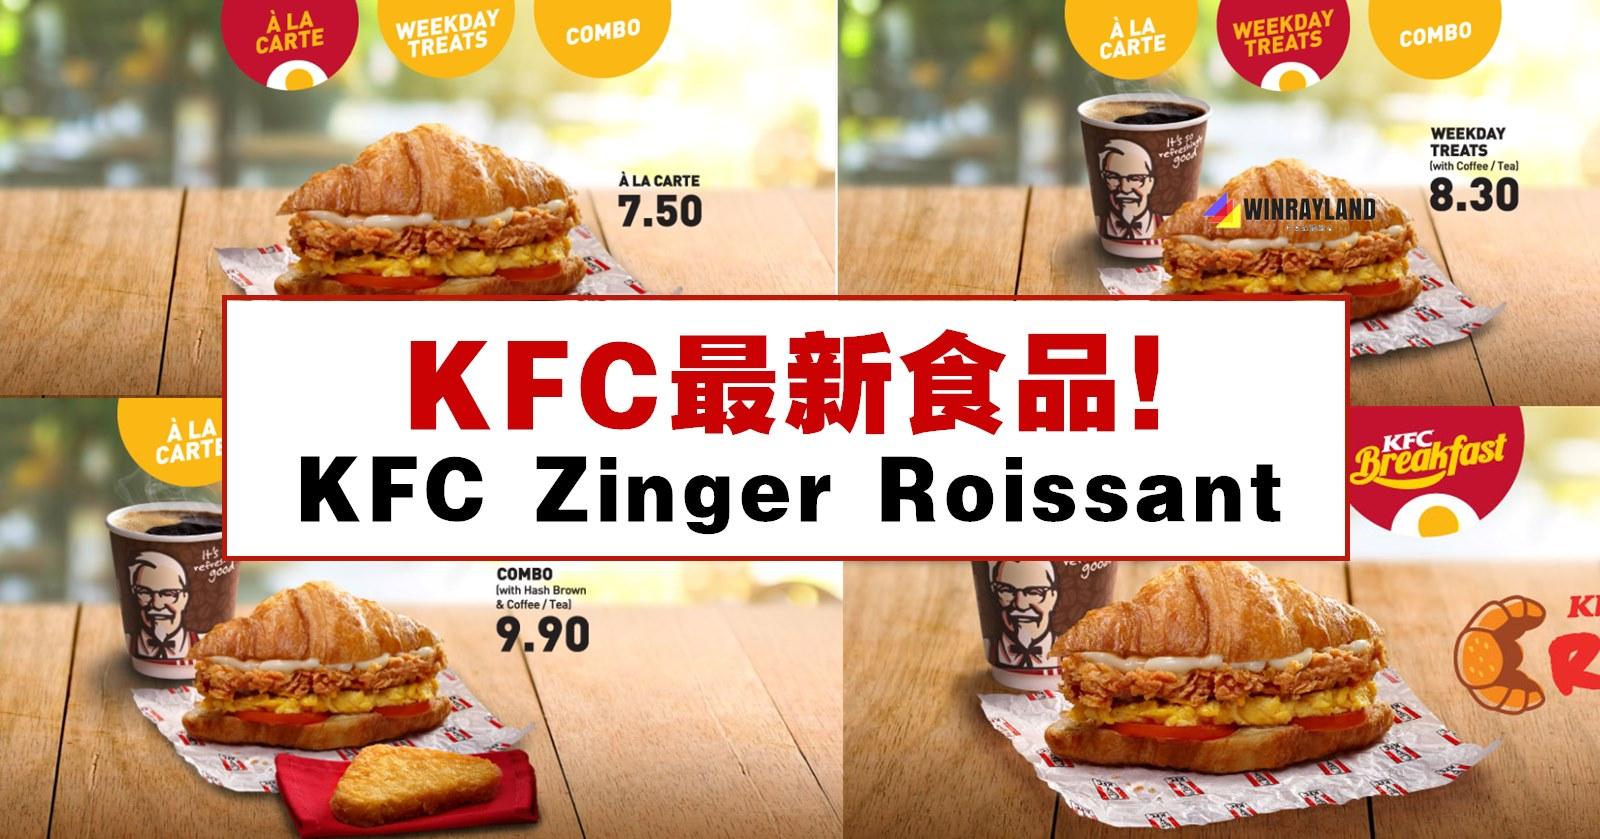 KFC最新食品!KFC Zinger Roissant